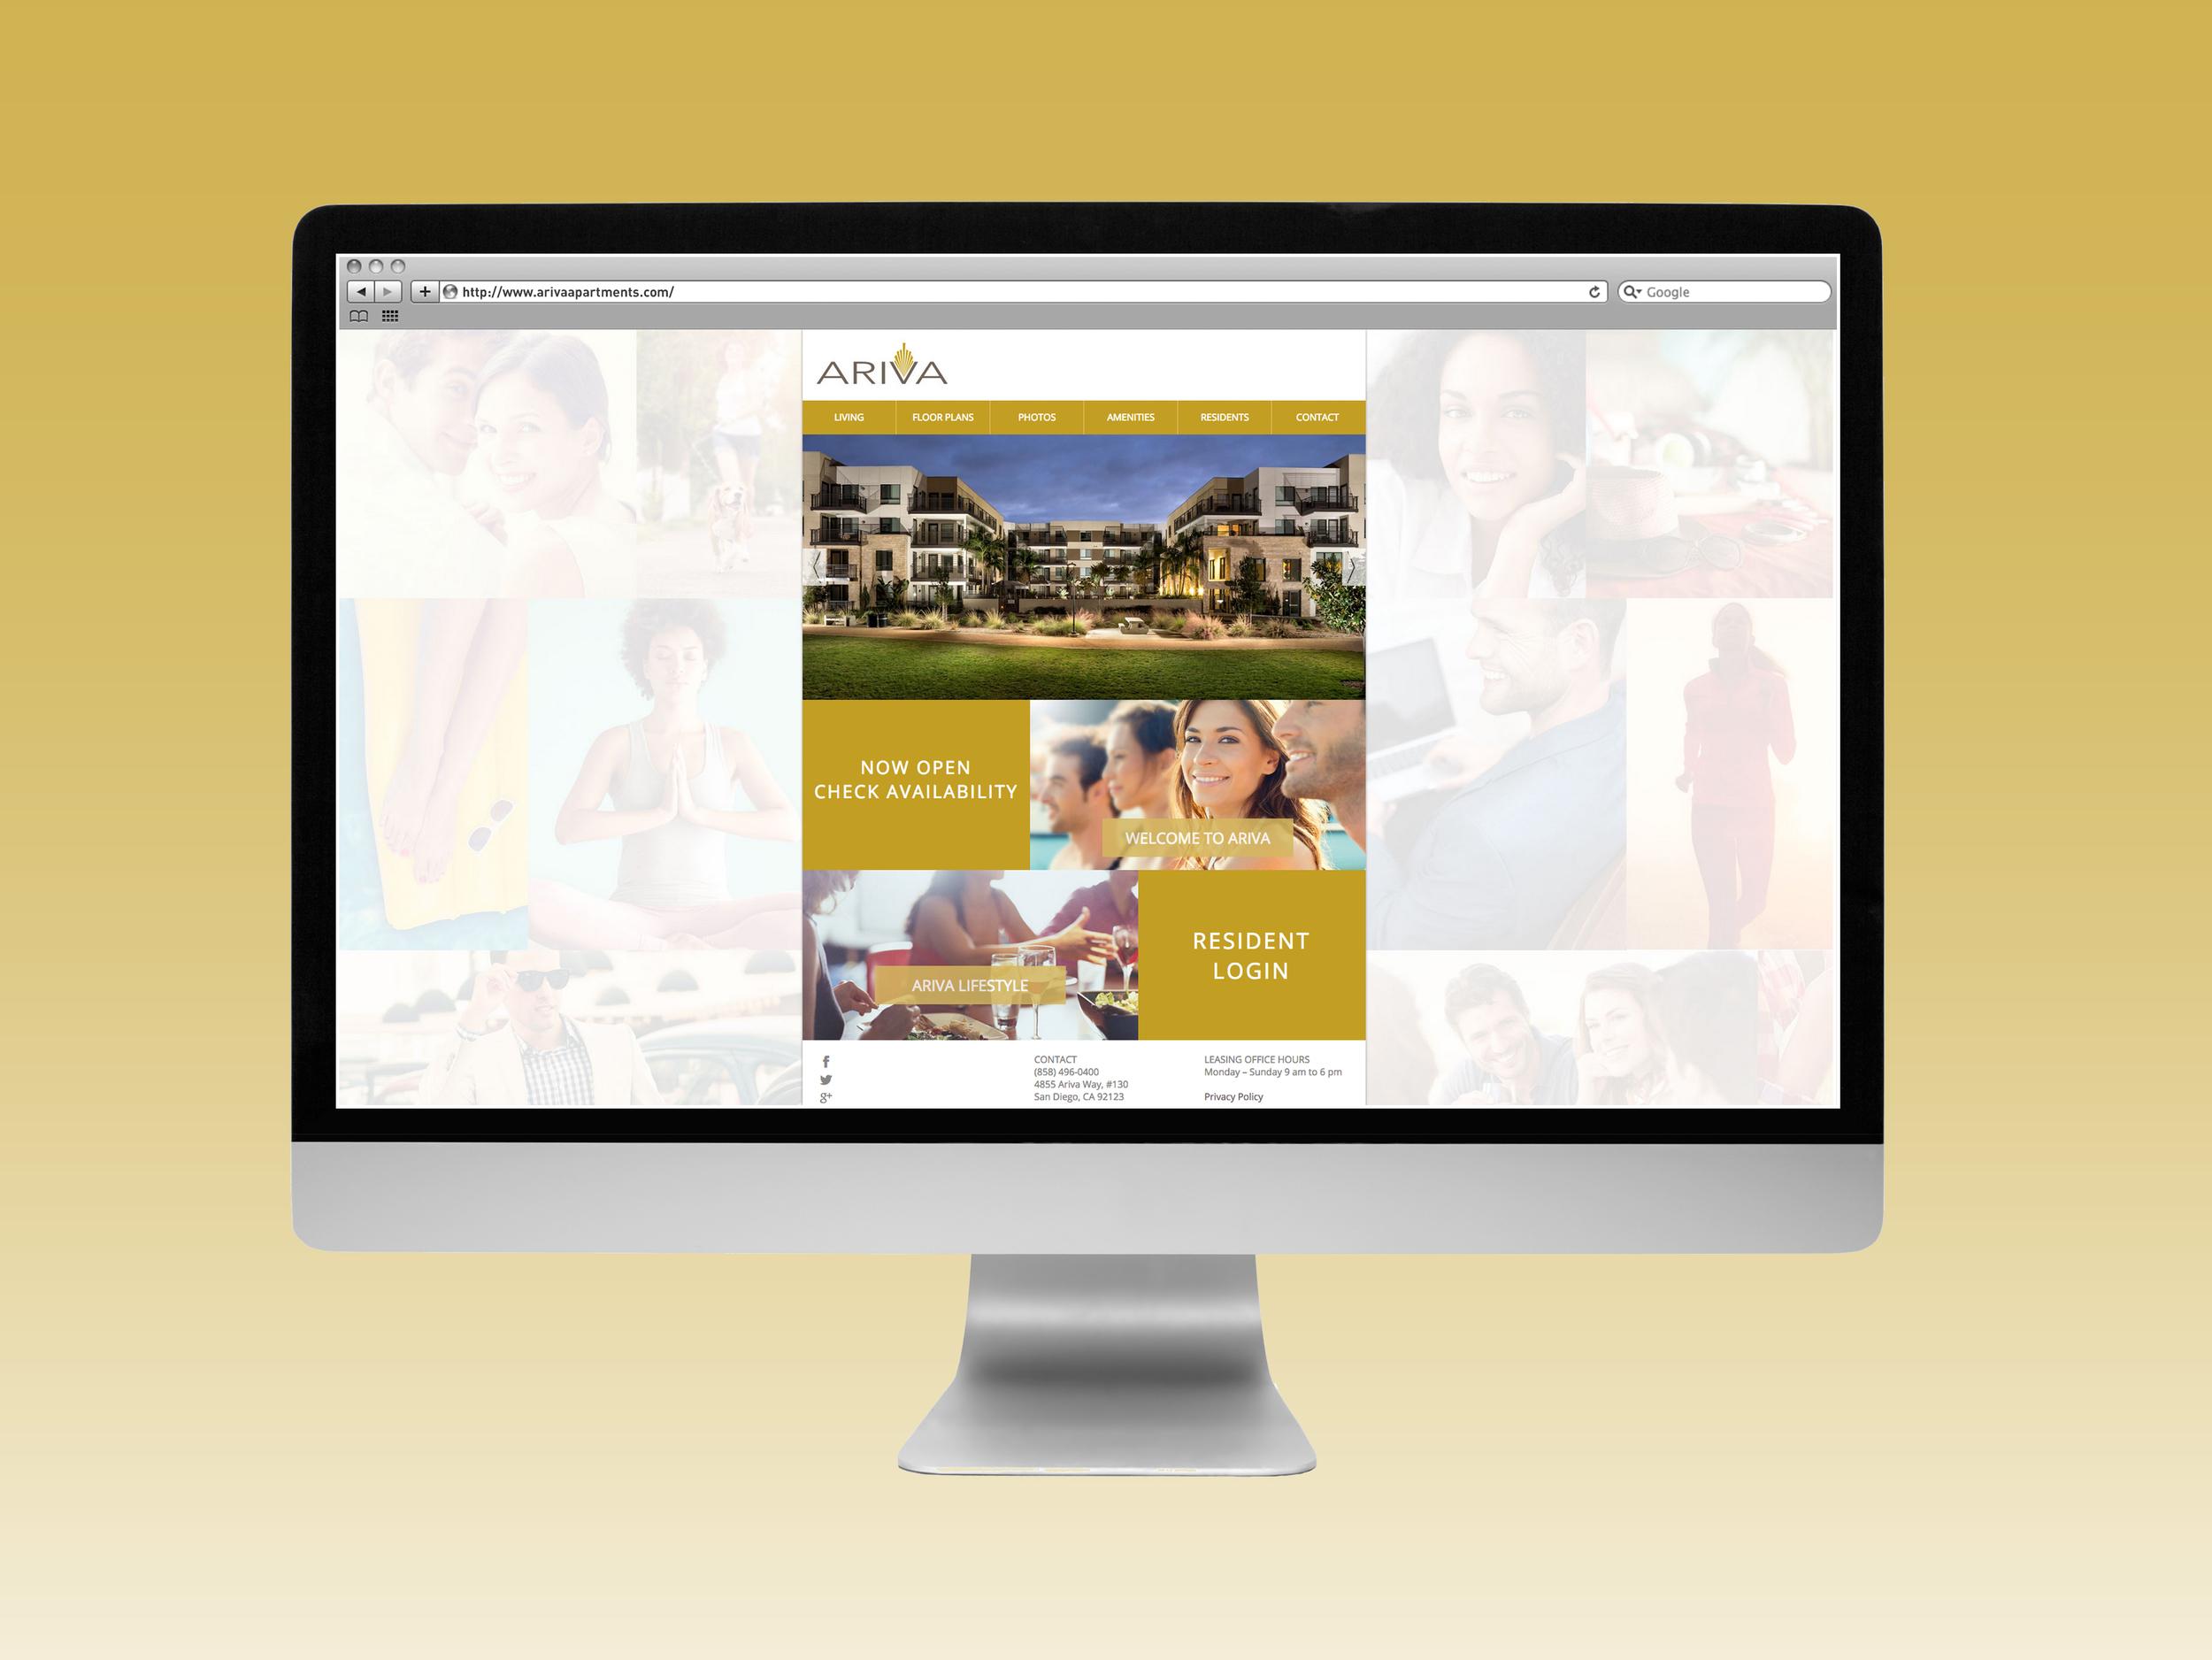 ARIVA_Website_web1 home.jpg